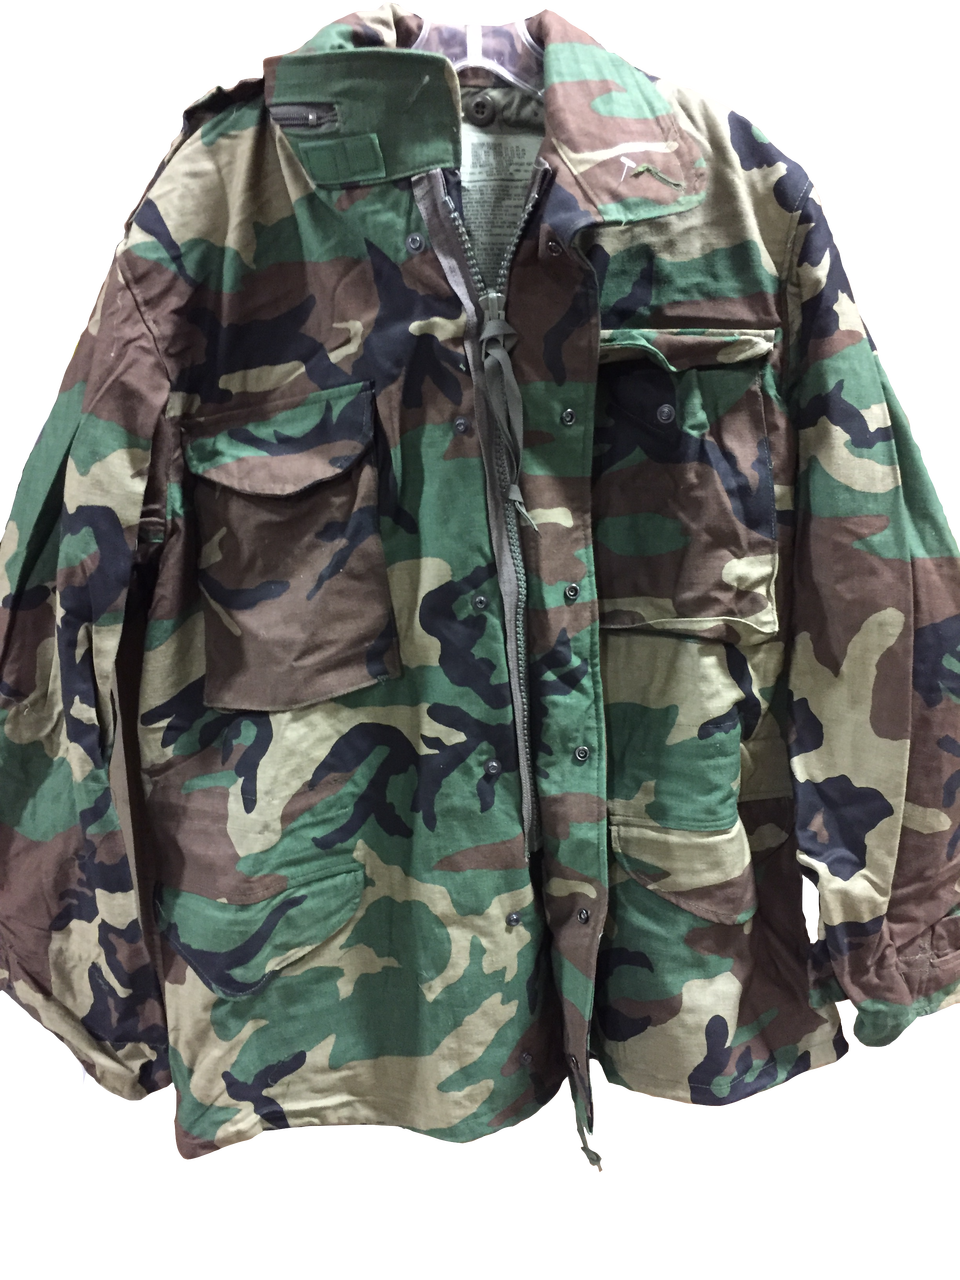 Military Issue M65 Woodland Field Jacket Medium - Army Surplus ... 1198f2d0b01